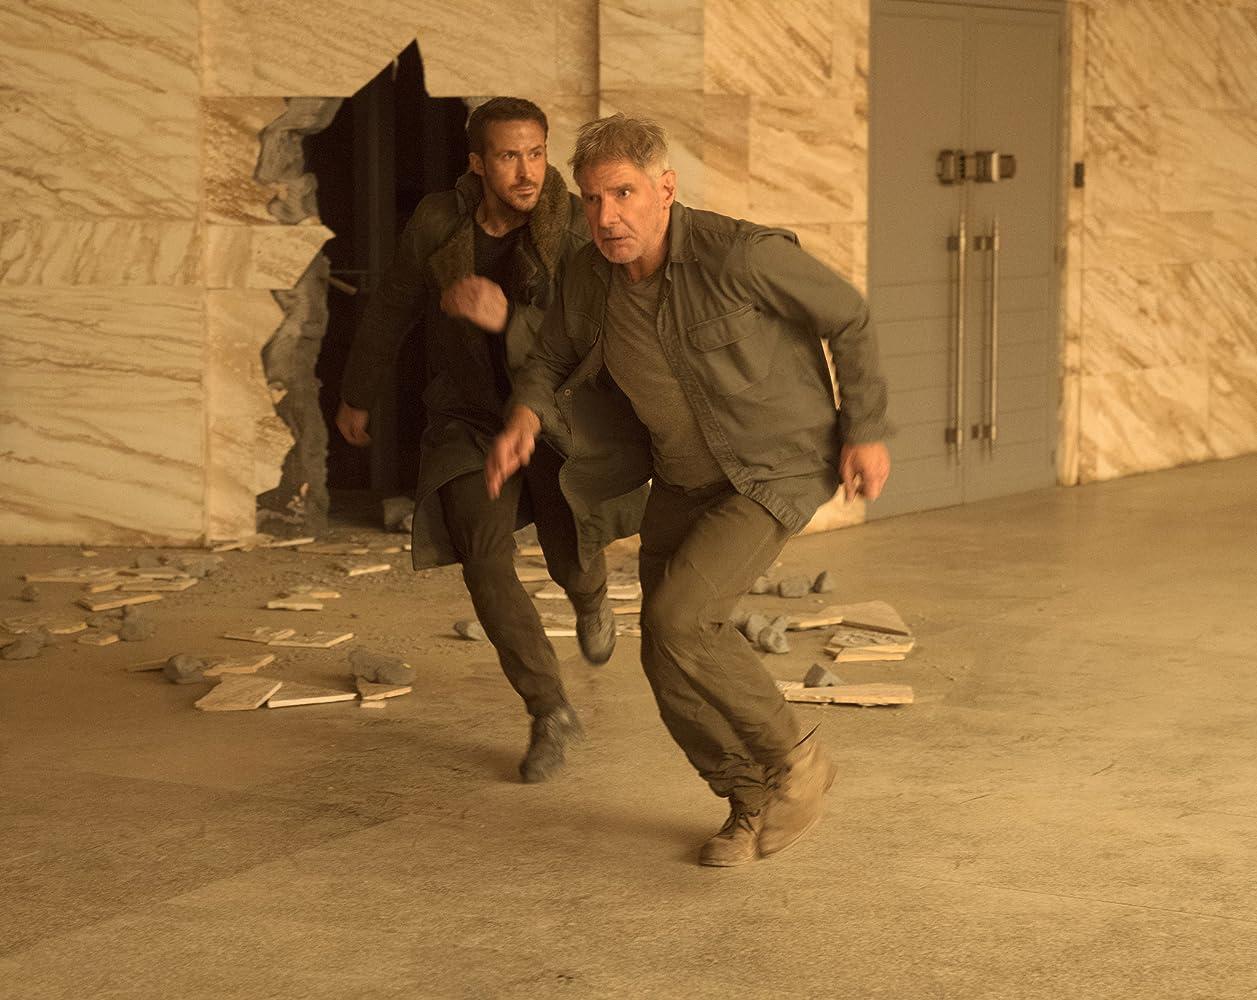 Harrison Ford and Ryan Gosling in Blade Runner 2049 (2017)